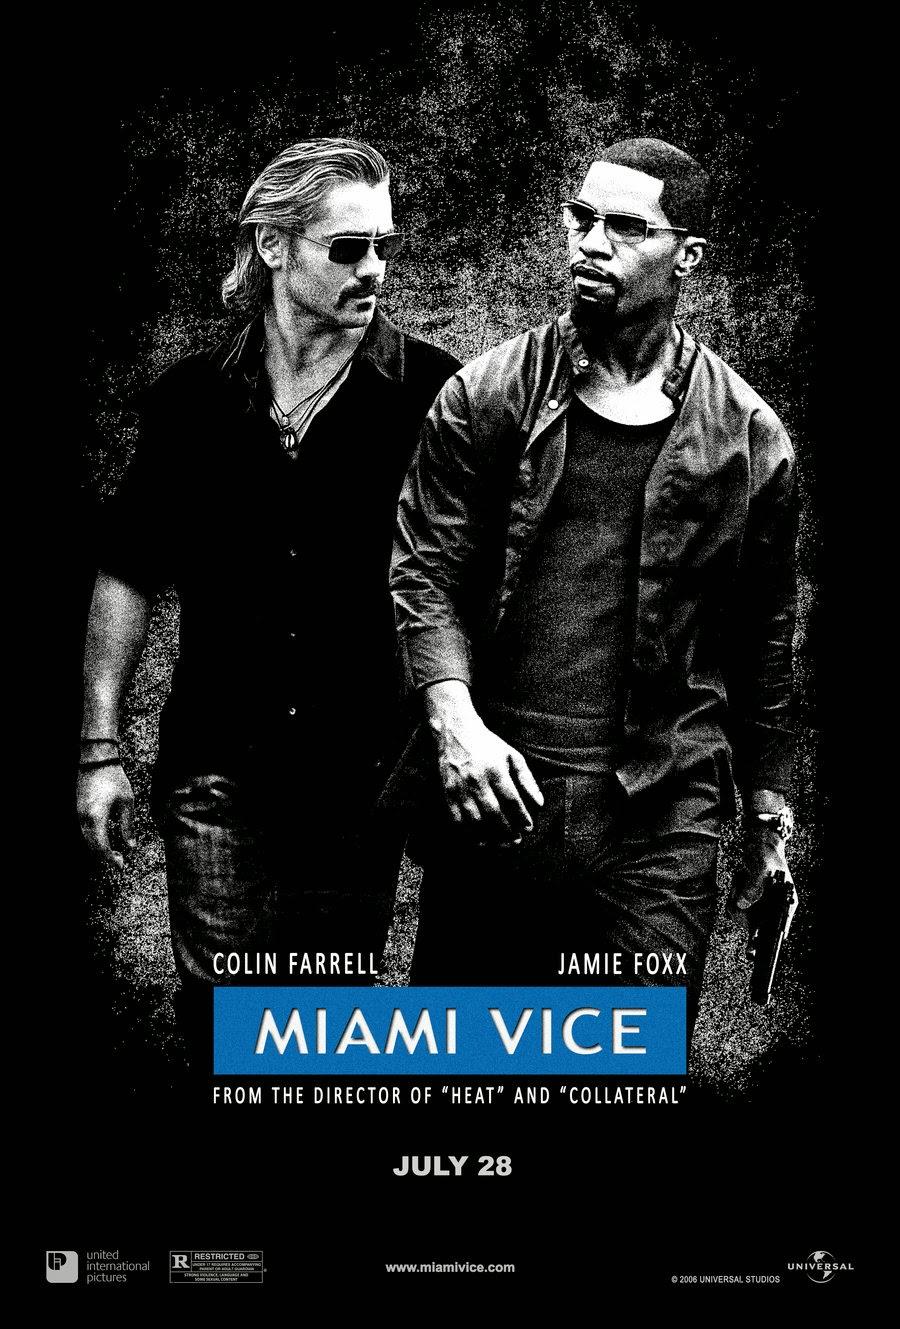 Miami_Vice_poster_by_drMIERZWIAK.jpg